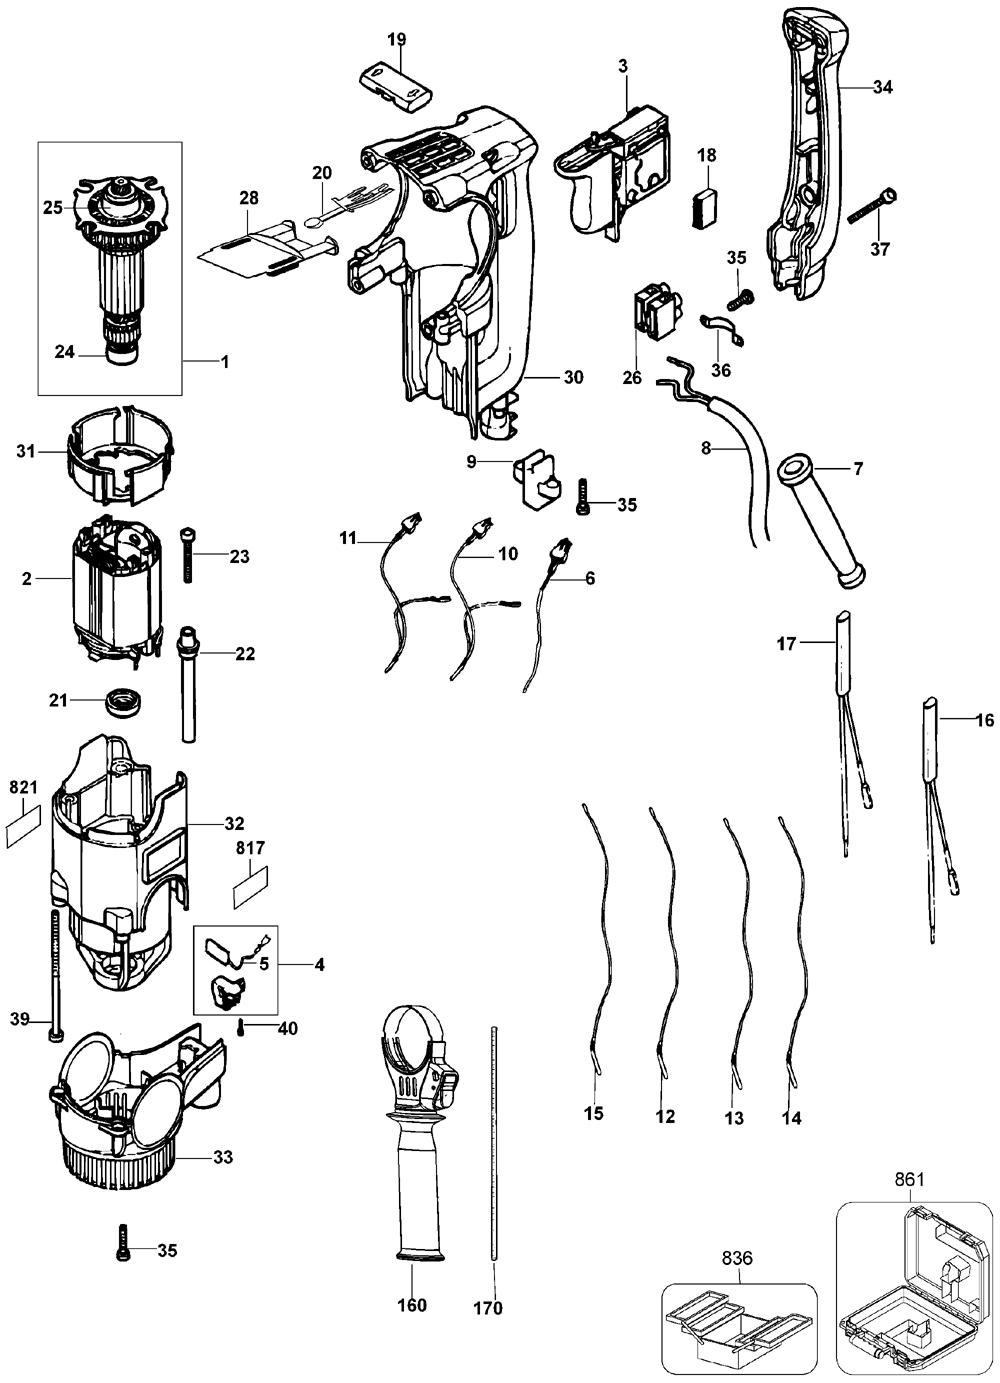 D25313K-T2-Dewalt-PB-1Break Down